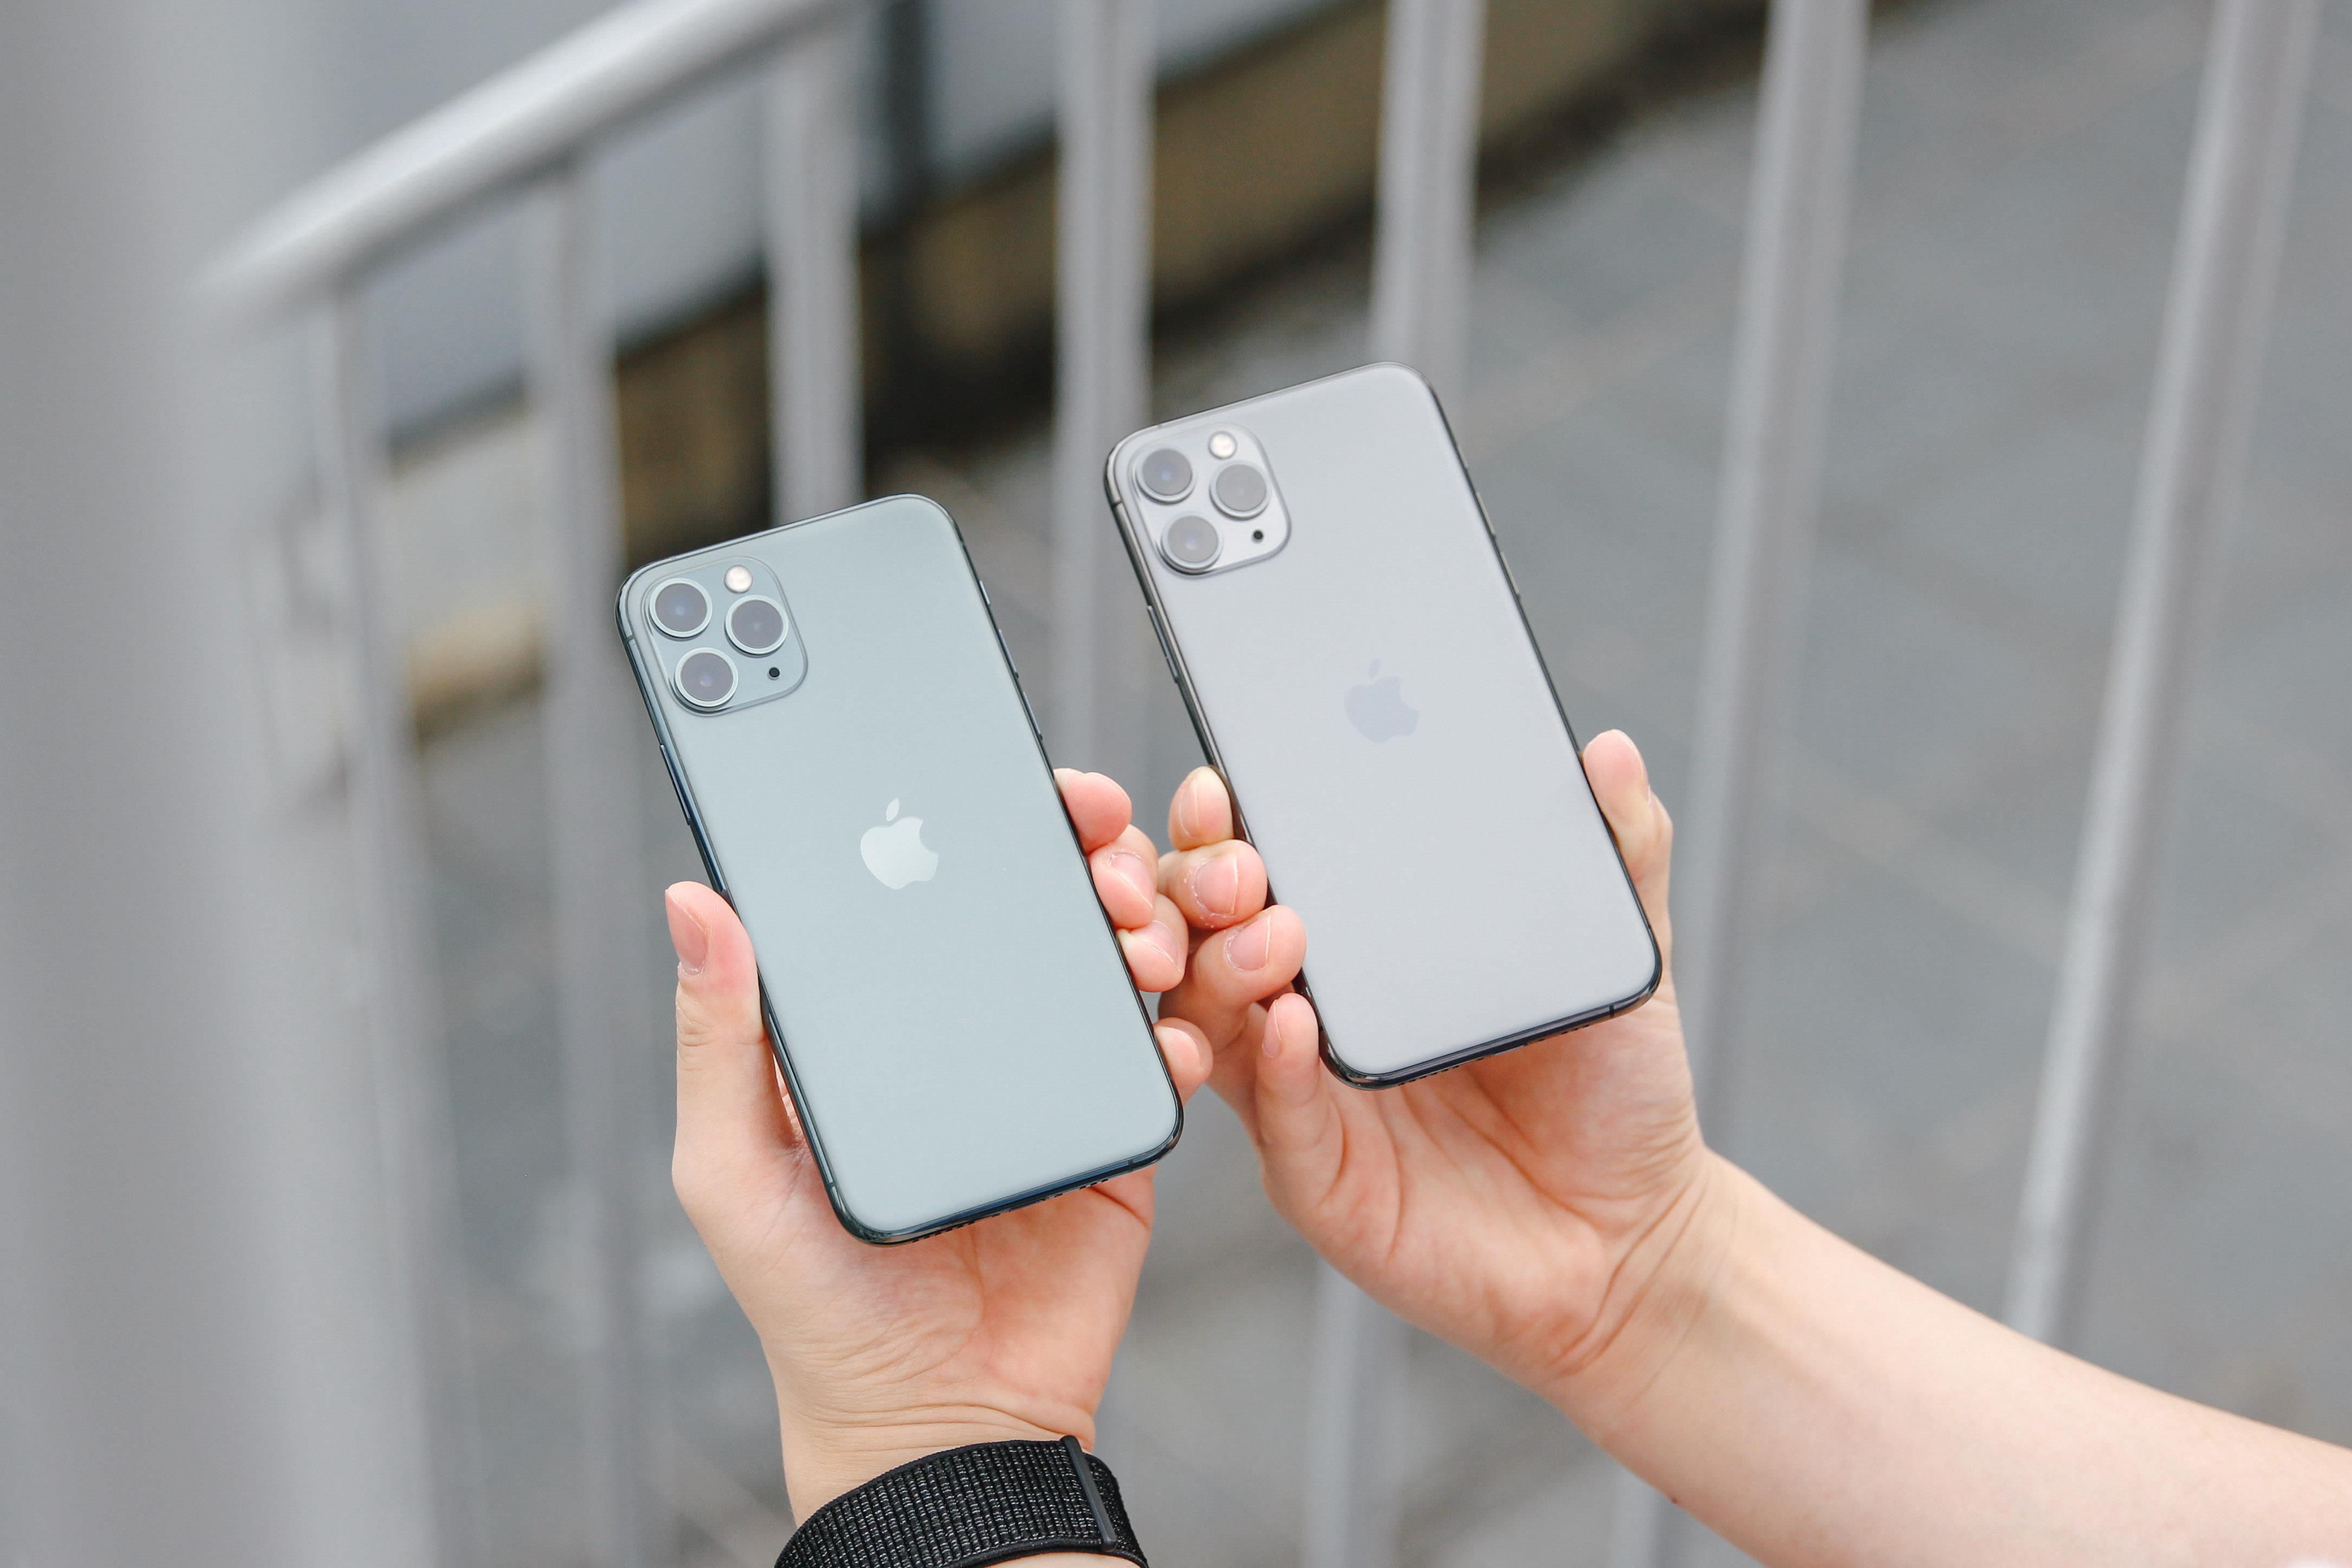 iPhone 11 Pro手机上手图赏 拿着它上街就是这么自信